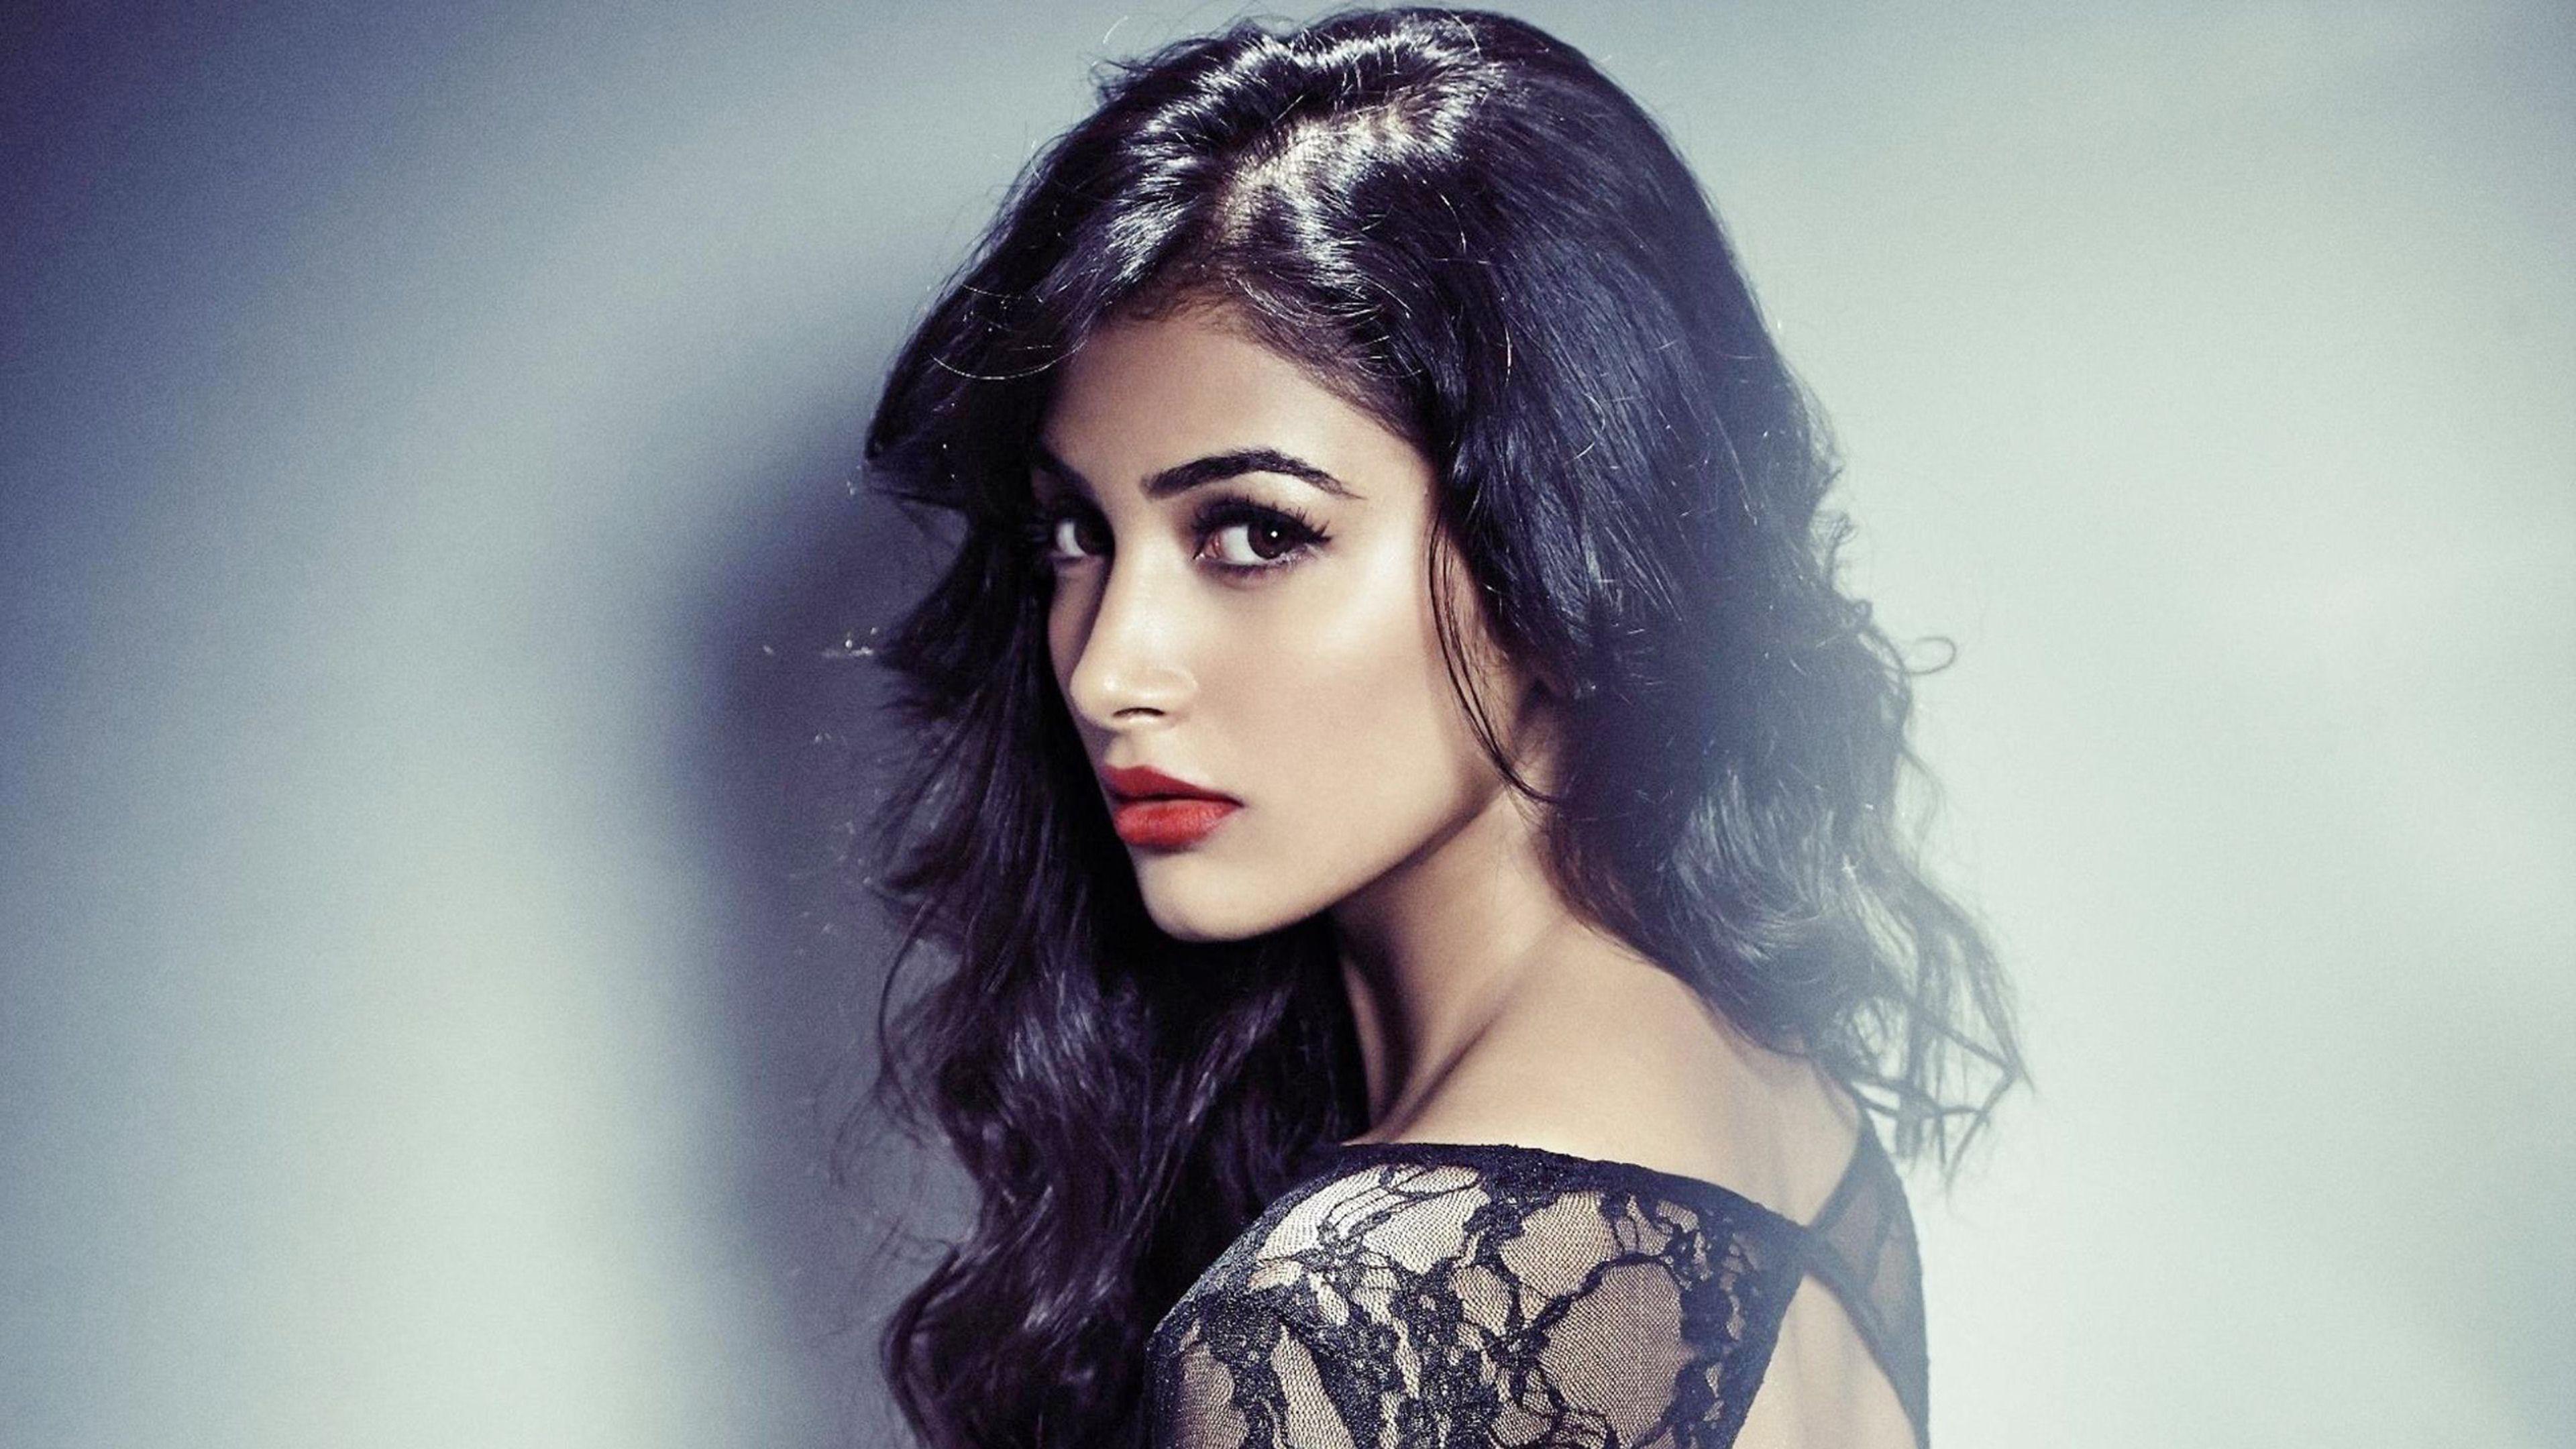 download hot mohenjo daro actress pooja hegde 720x1280 resolution